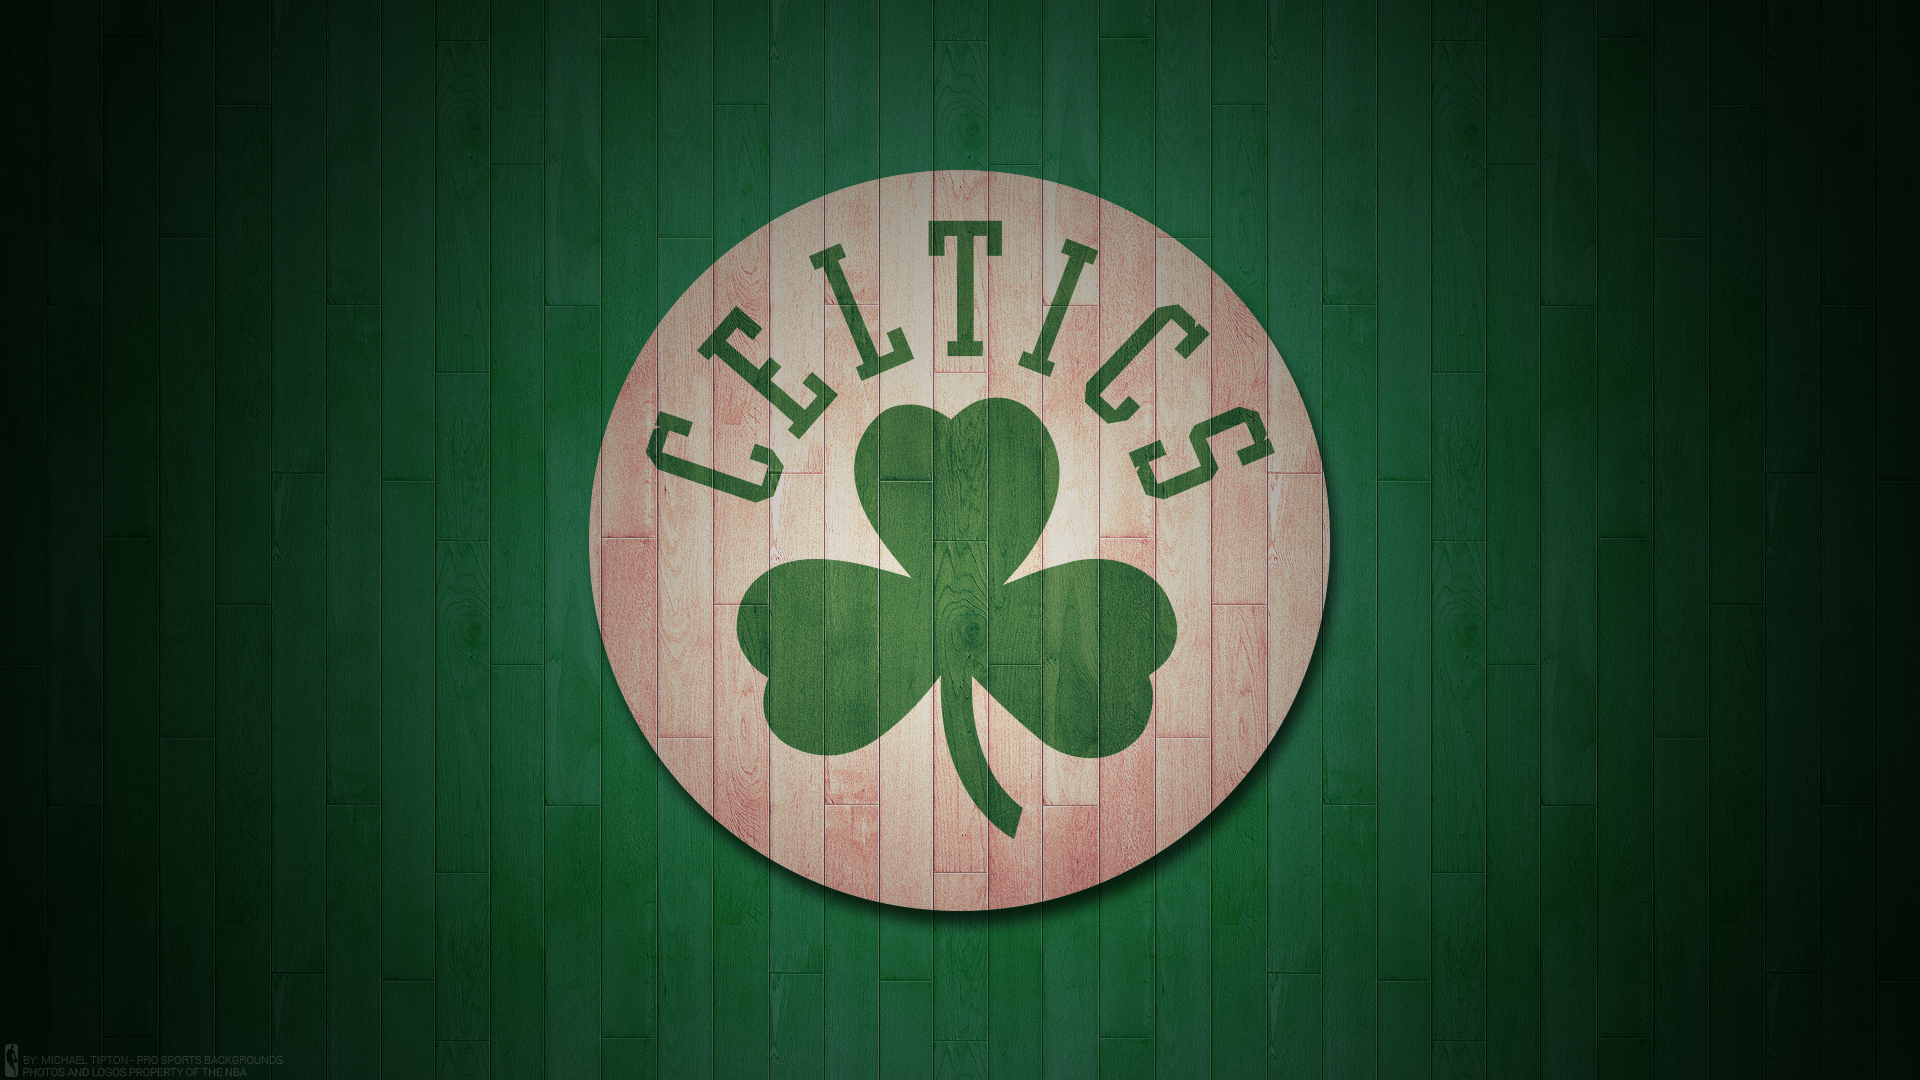 Boston Celtics HD Wallpaper | Background Image | 1920x1080 | ID:981312 - Wallpaper Abyss